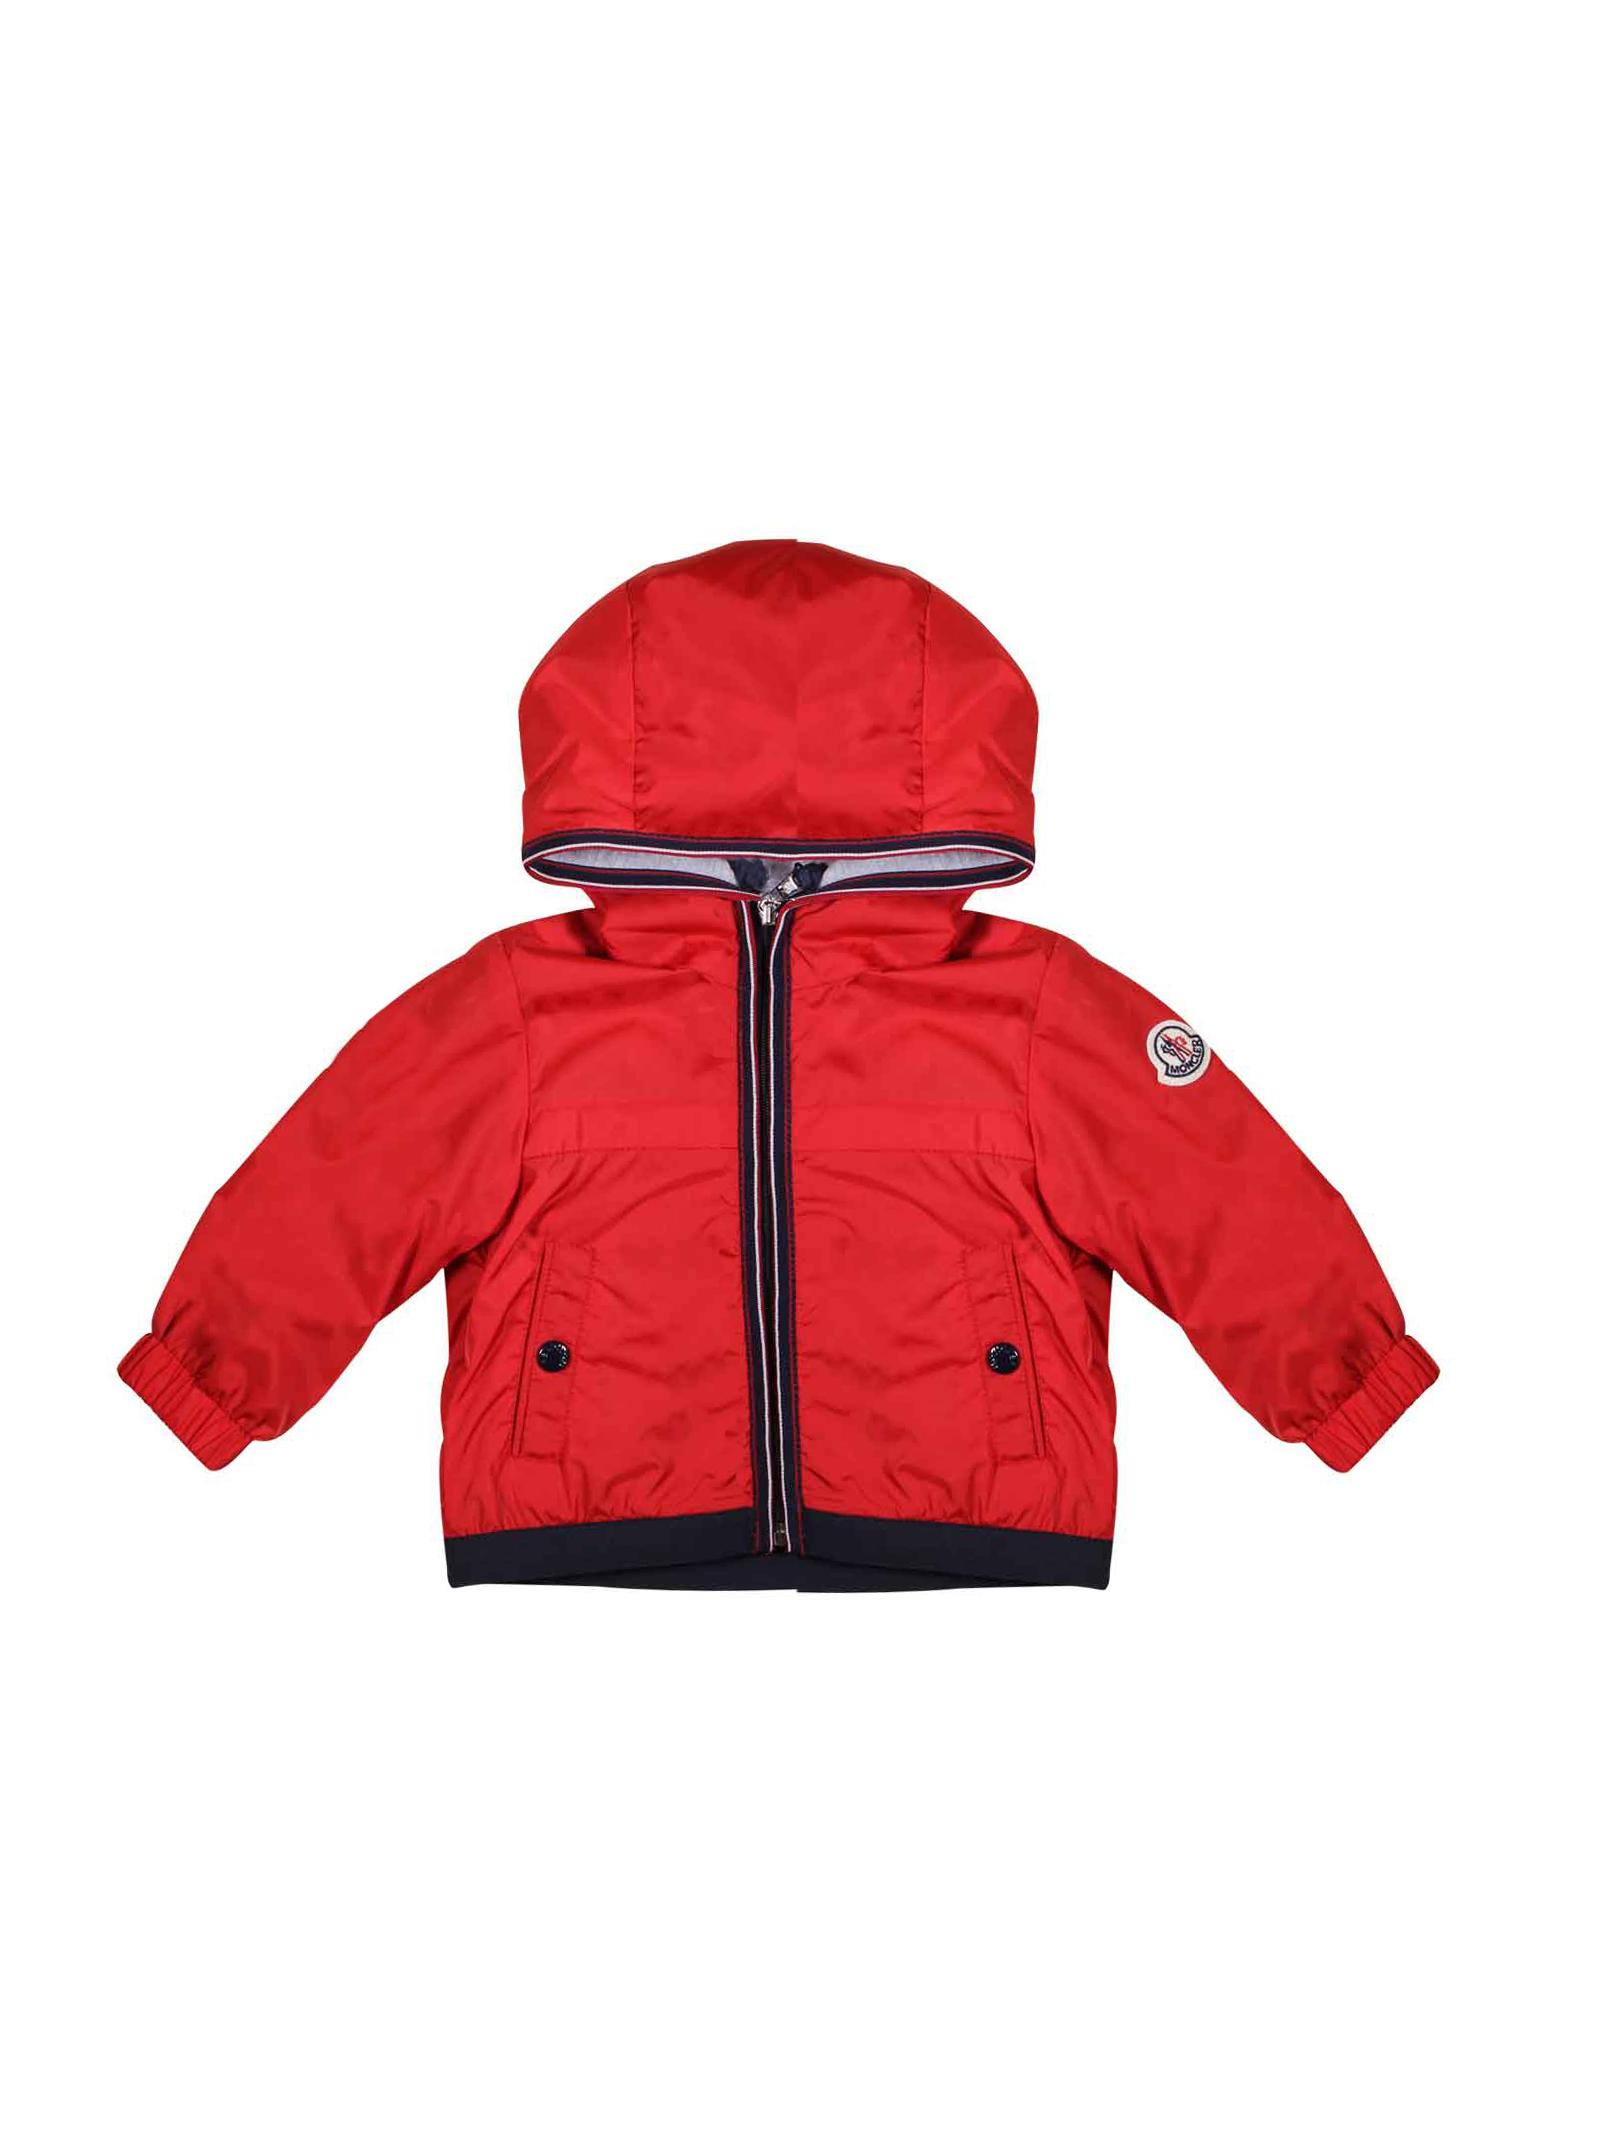 9e8ebb11 ... JACKET ANTON FOR BOY MONCLER KIDS Moncler Kids   13   411670568352456  ...